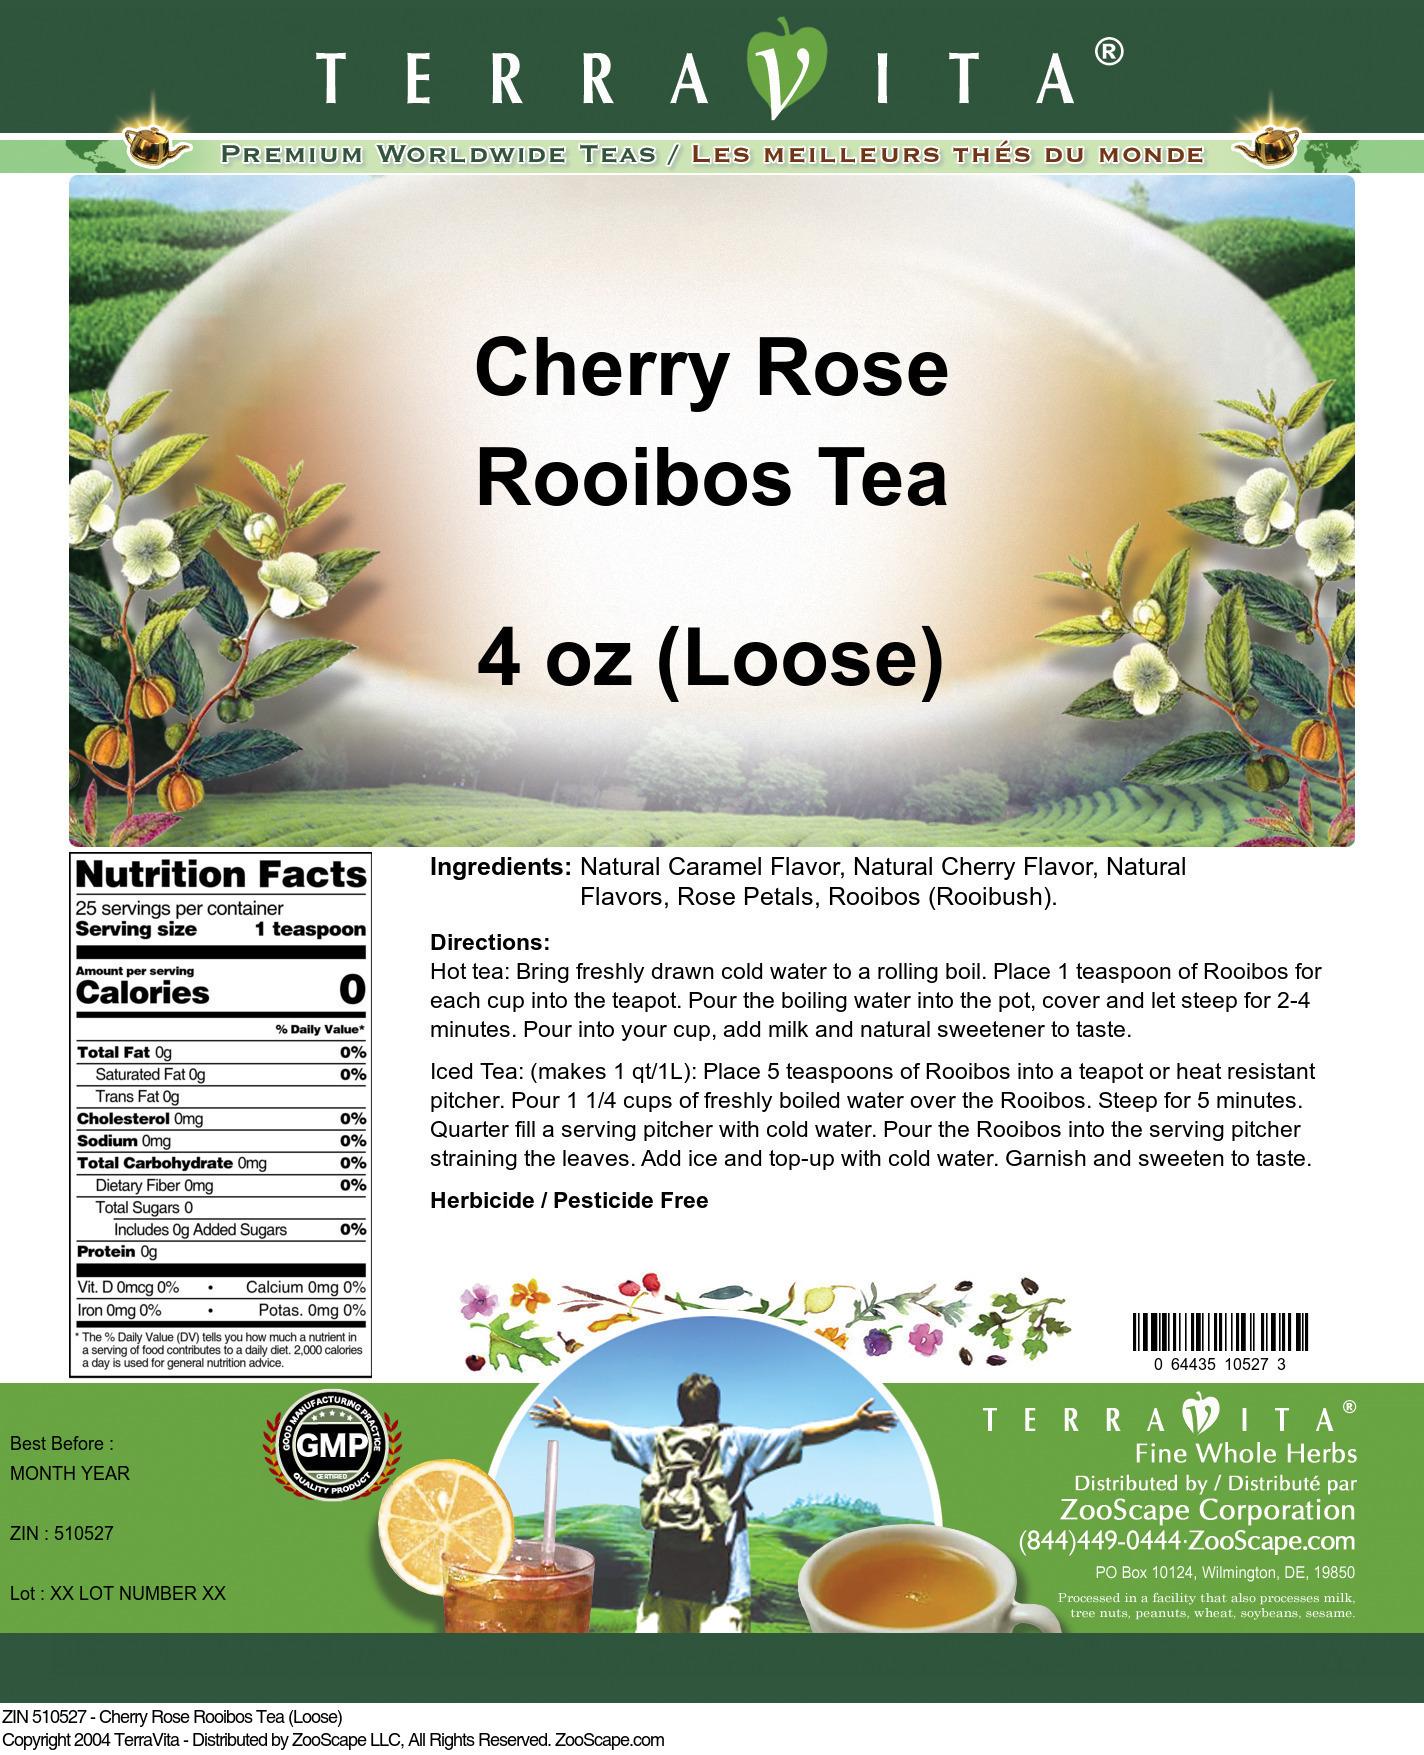 Cherry Rose Rooibos Tea (Loose) - Label